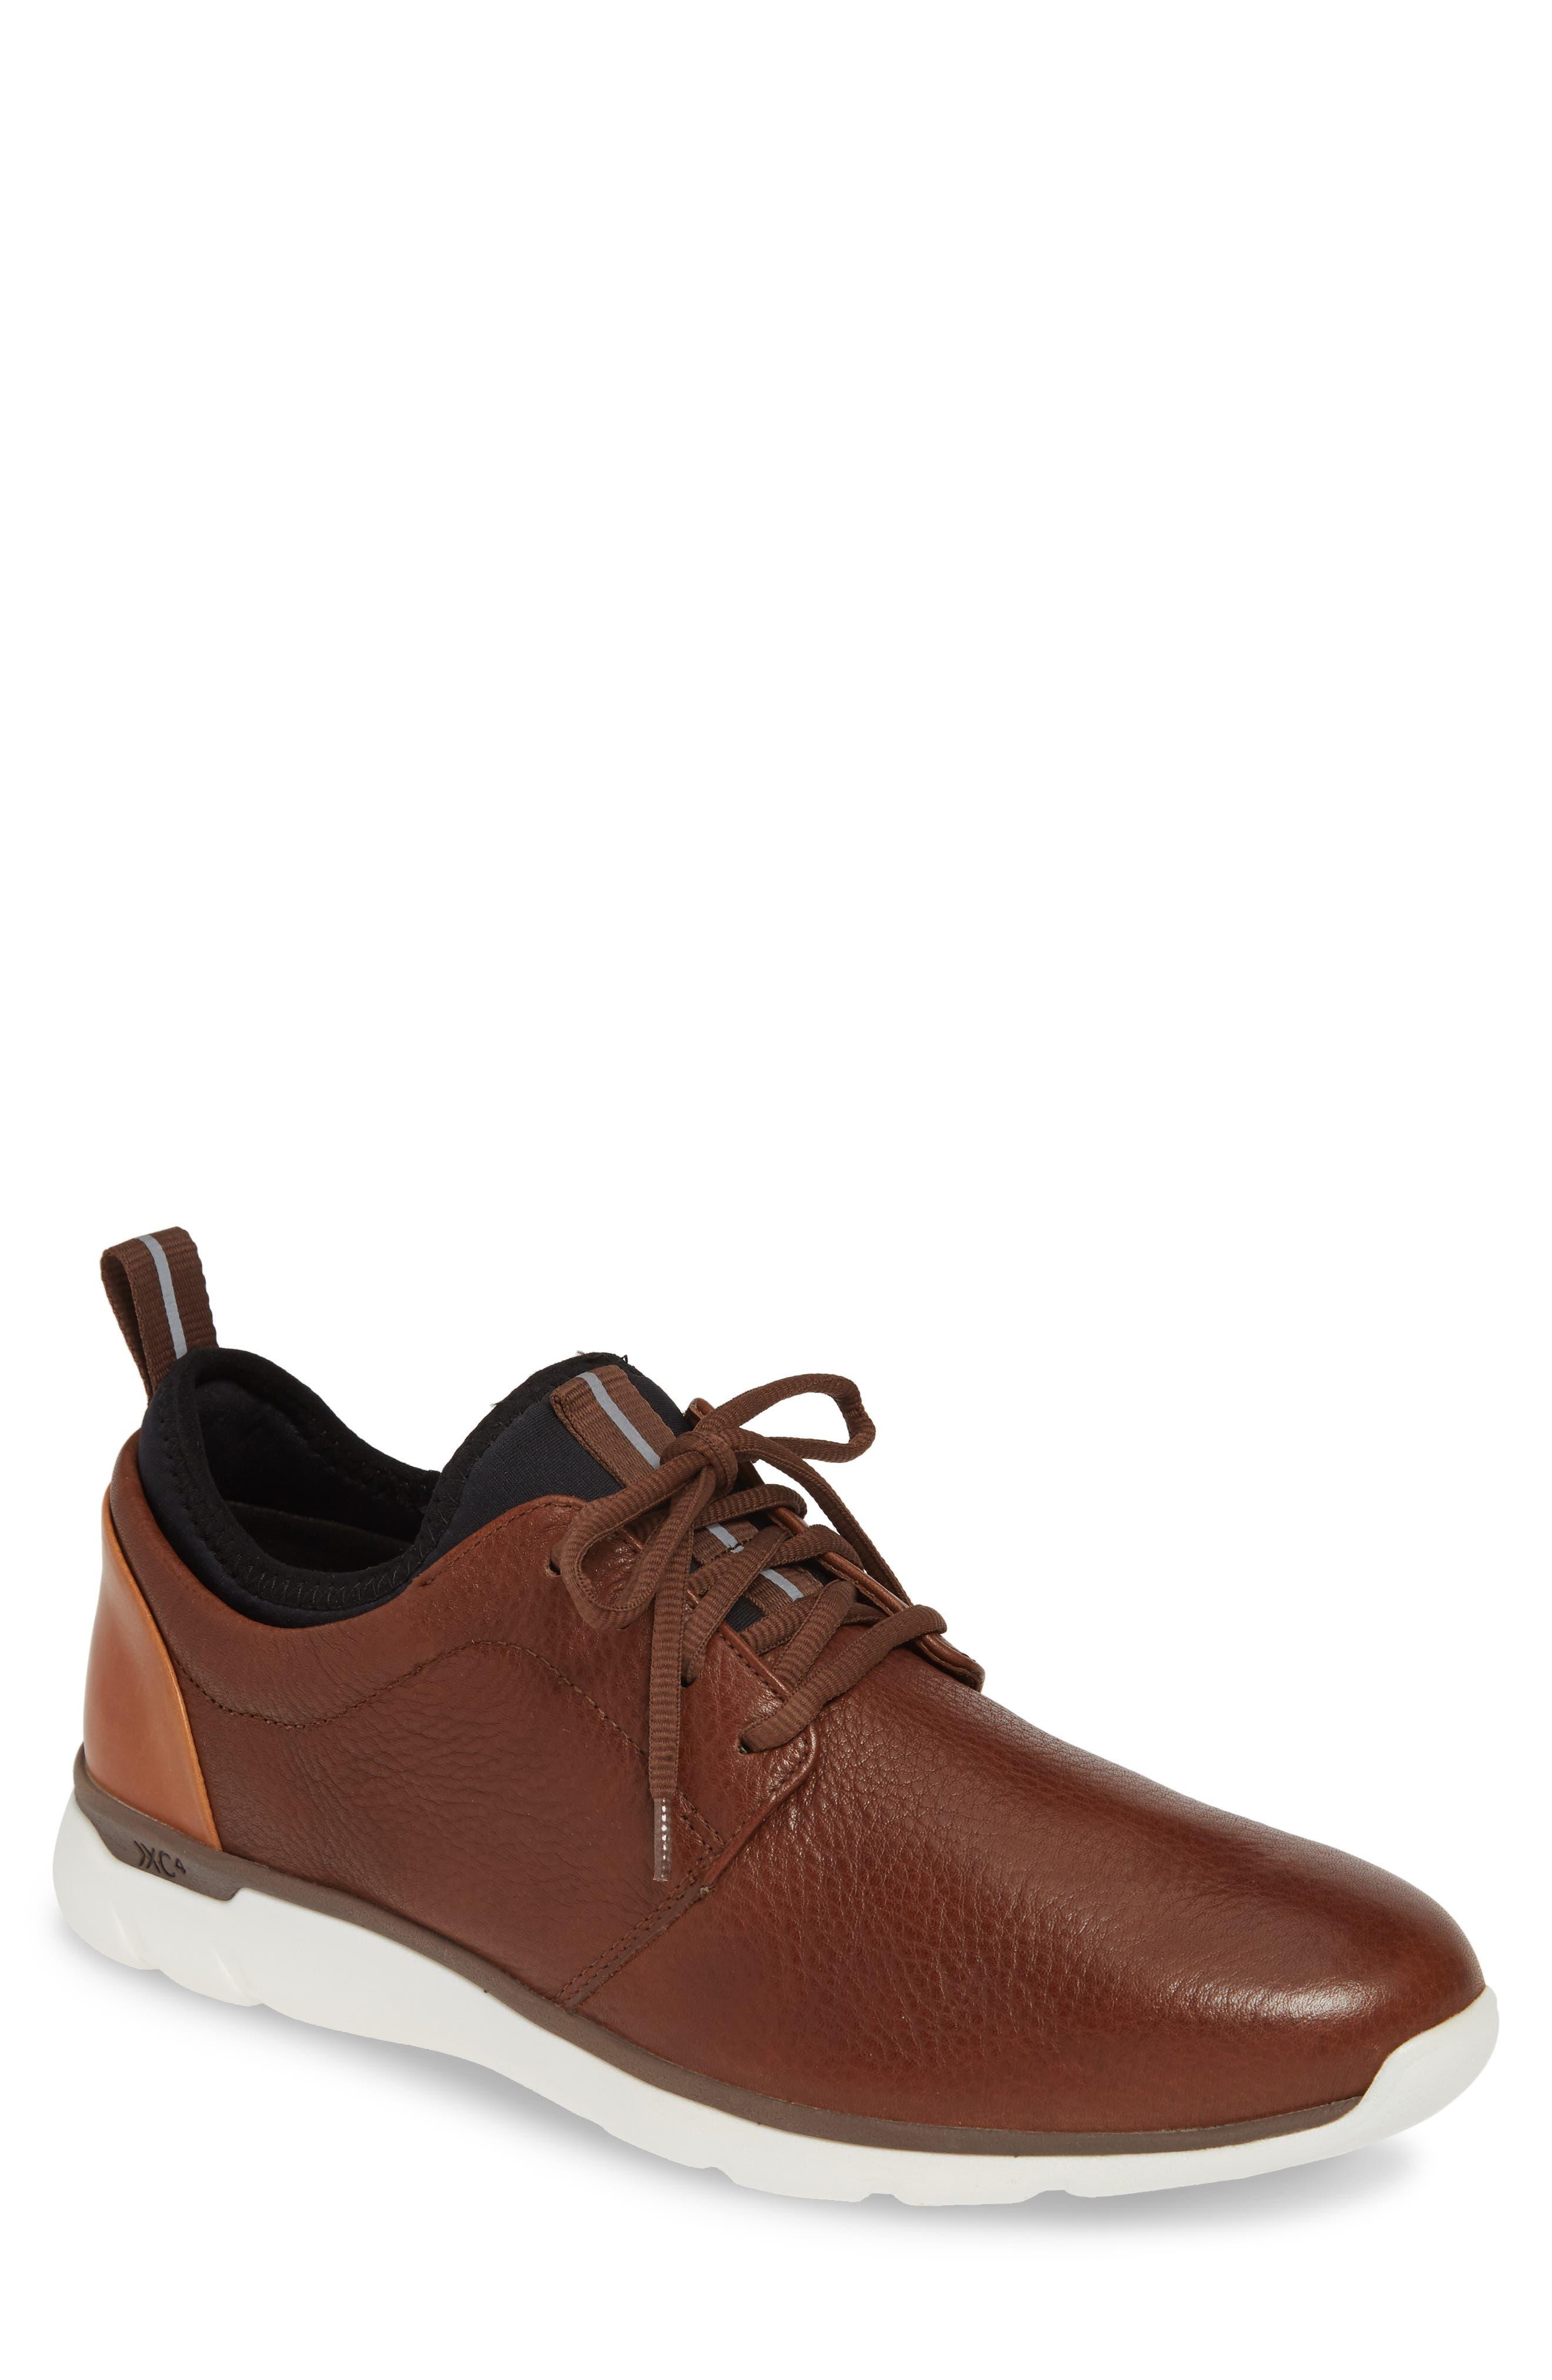 JOHNSTON & MURPHY, Prentiss XC4<sup>®</sup> Waterproof Low Top Sneaker, Main thumbnail 1, color, MAHOGANY LEATHER